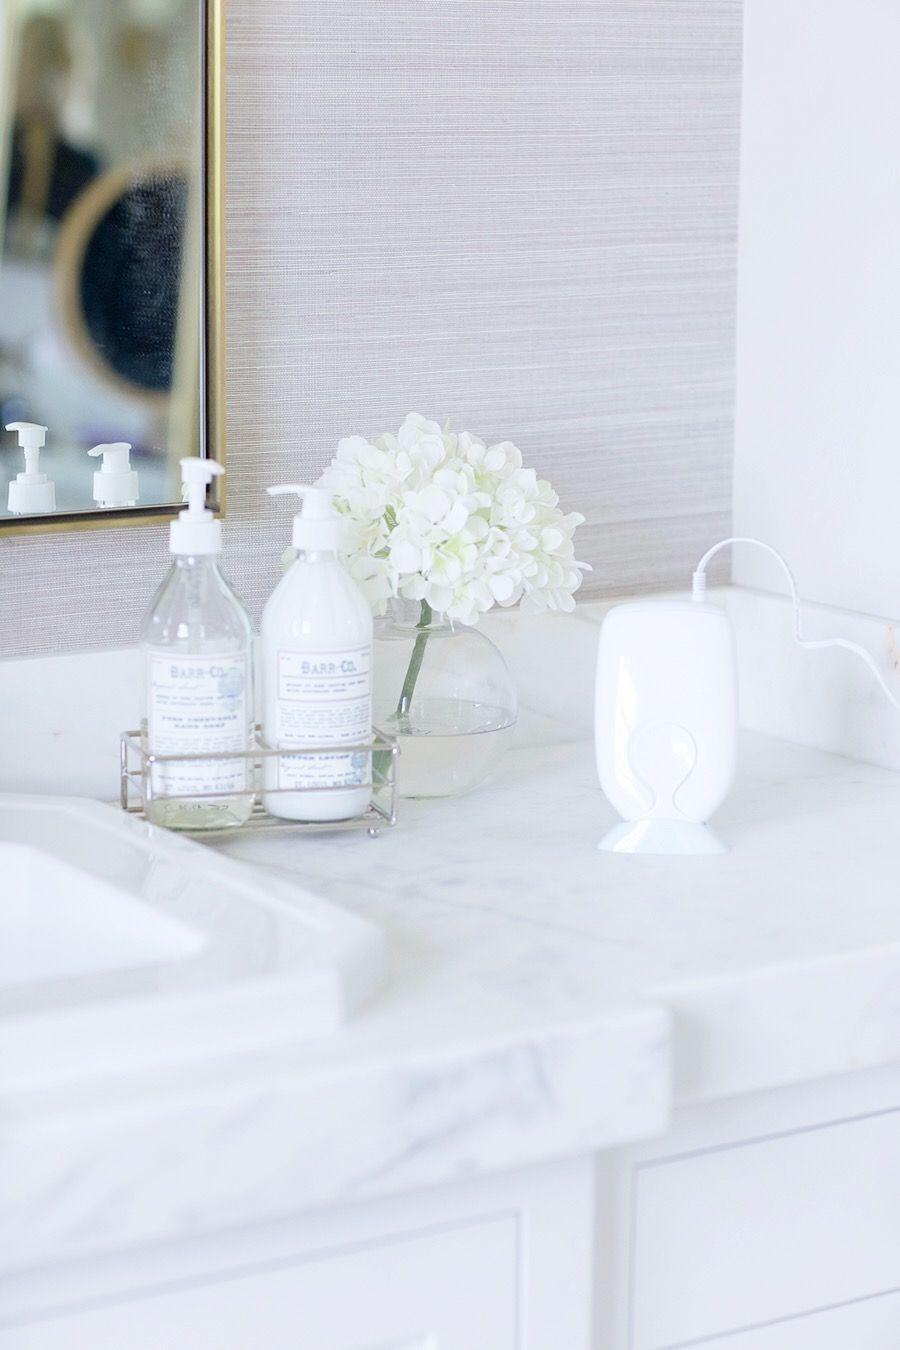 Styled Space Emily Jackson Of The Ivory Lane's Beautiful Utah Amusing Utah Bathroom Remodel Decorating Design